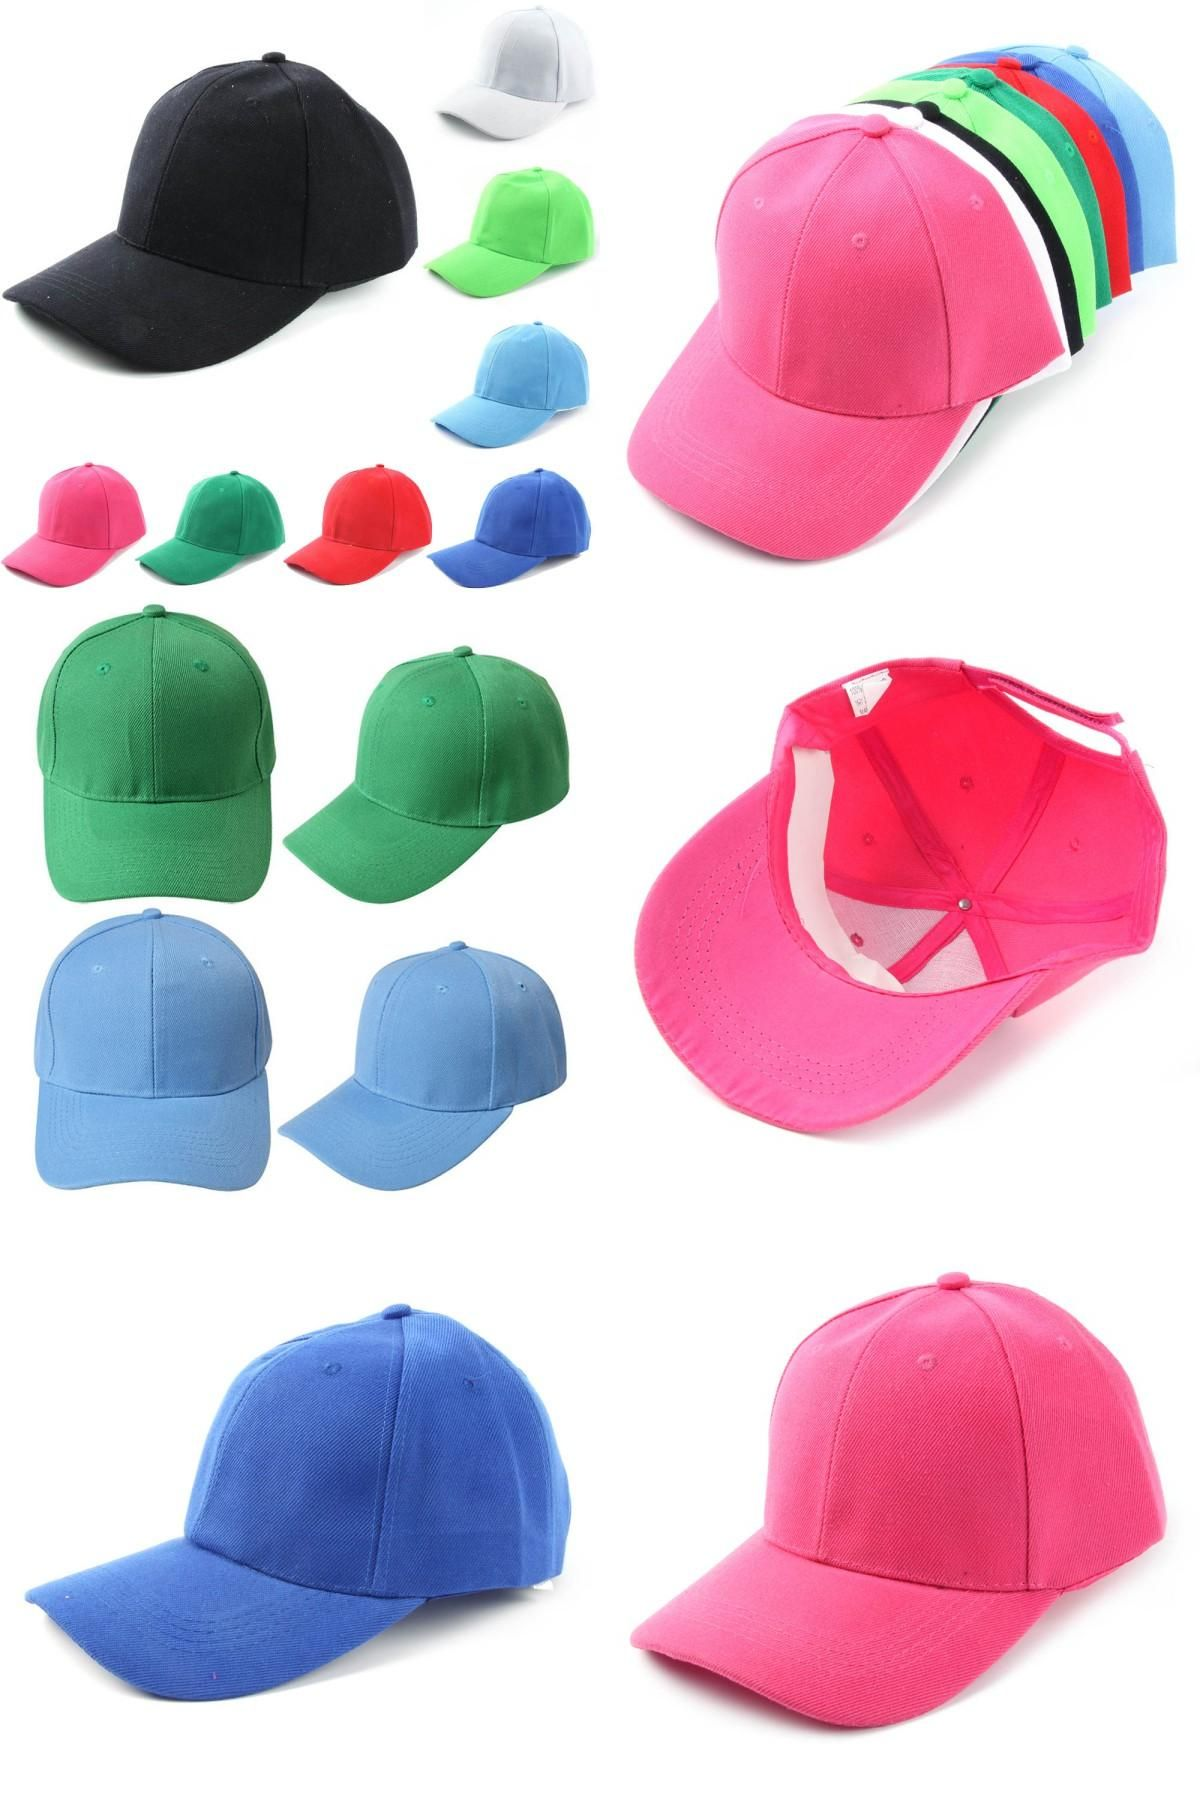 Visit to Buy  Fashion Unisex Plain Solid Cotton Baseball Cap Blank Hat  Washed Cotton e91867b4138